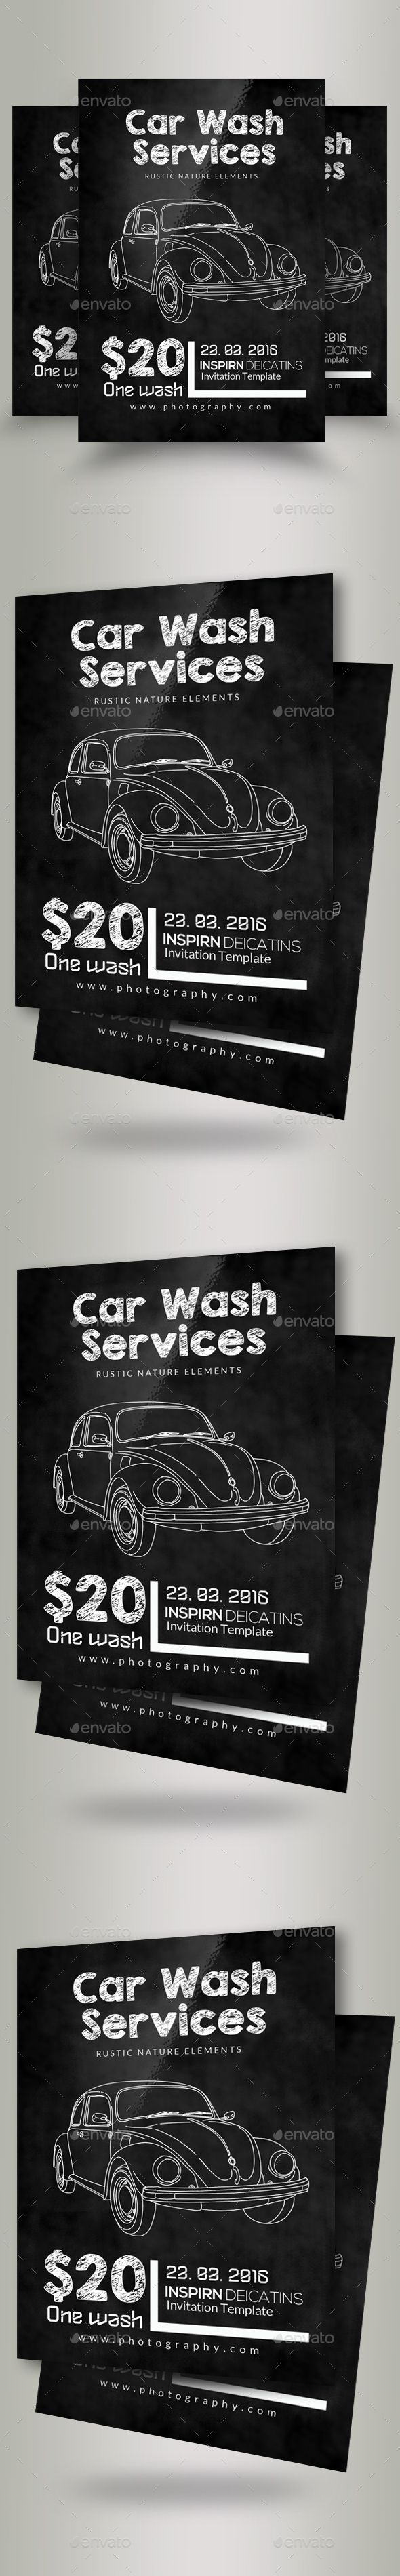 Best 25 Car washes ideas on Pinterest